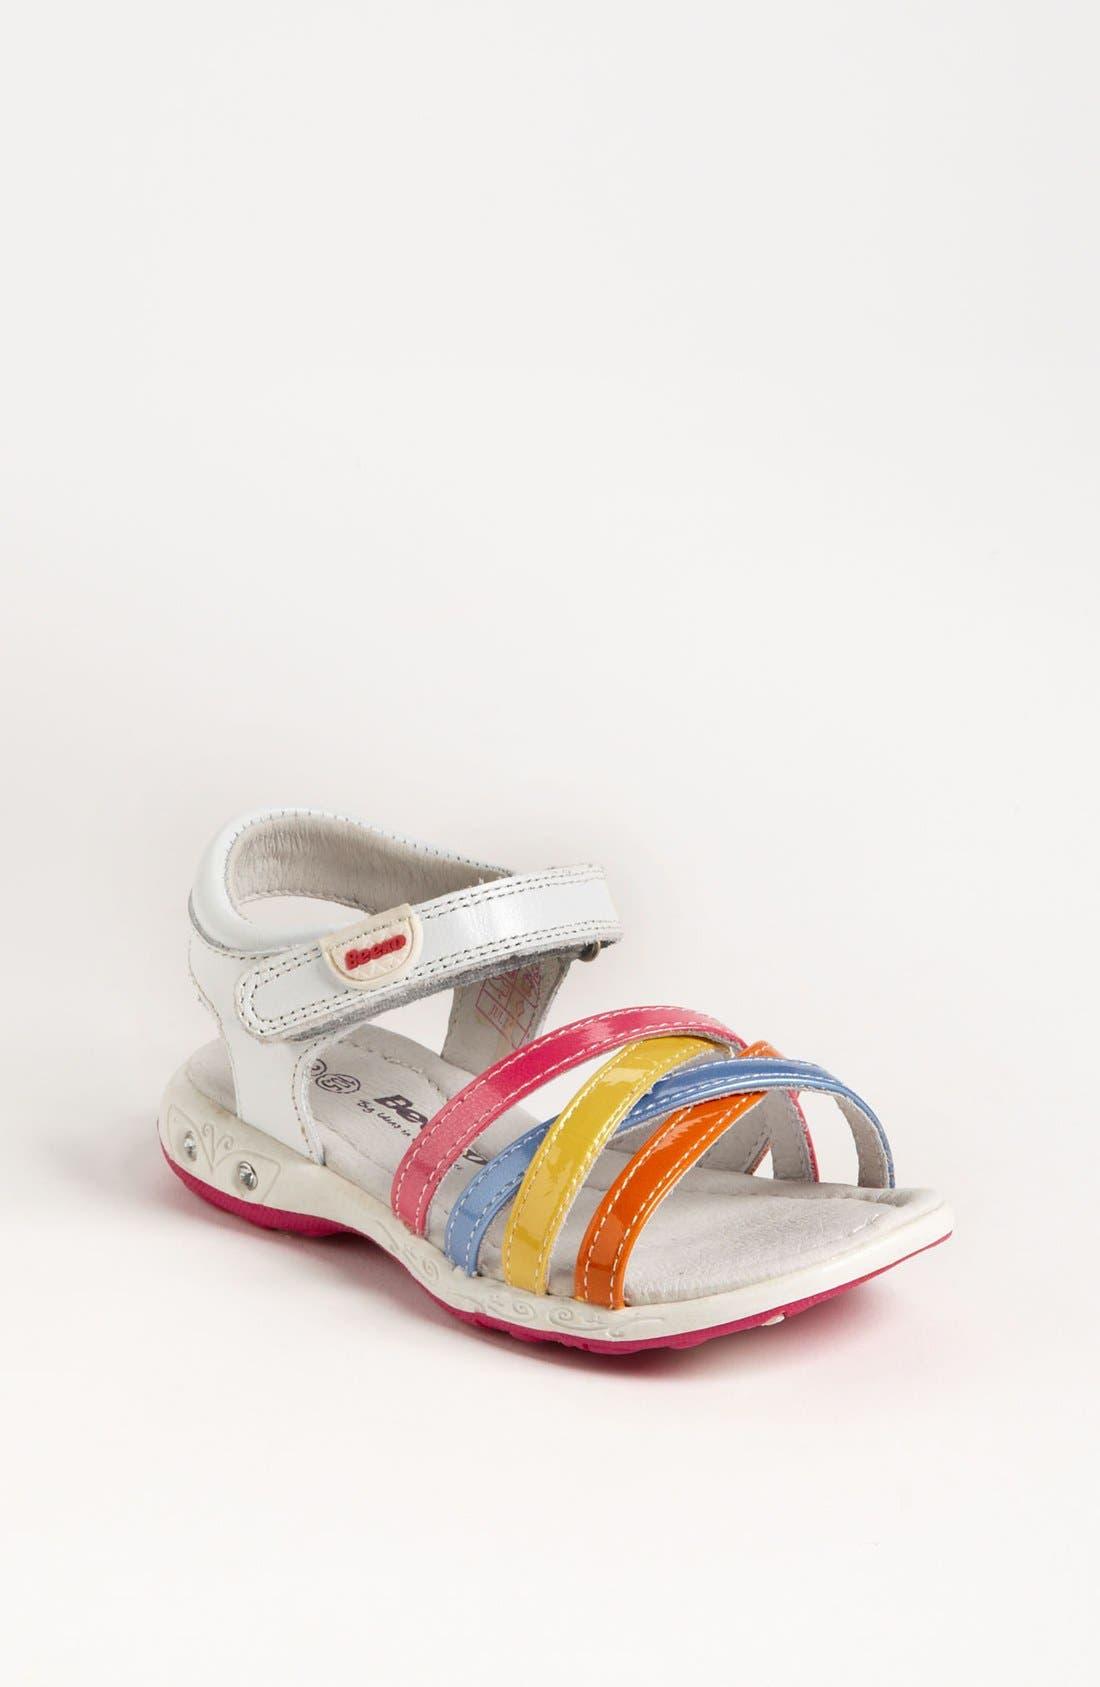 Alternate Image 1 Selected - Beeko 'Julia' Sandal (Toddler)